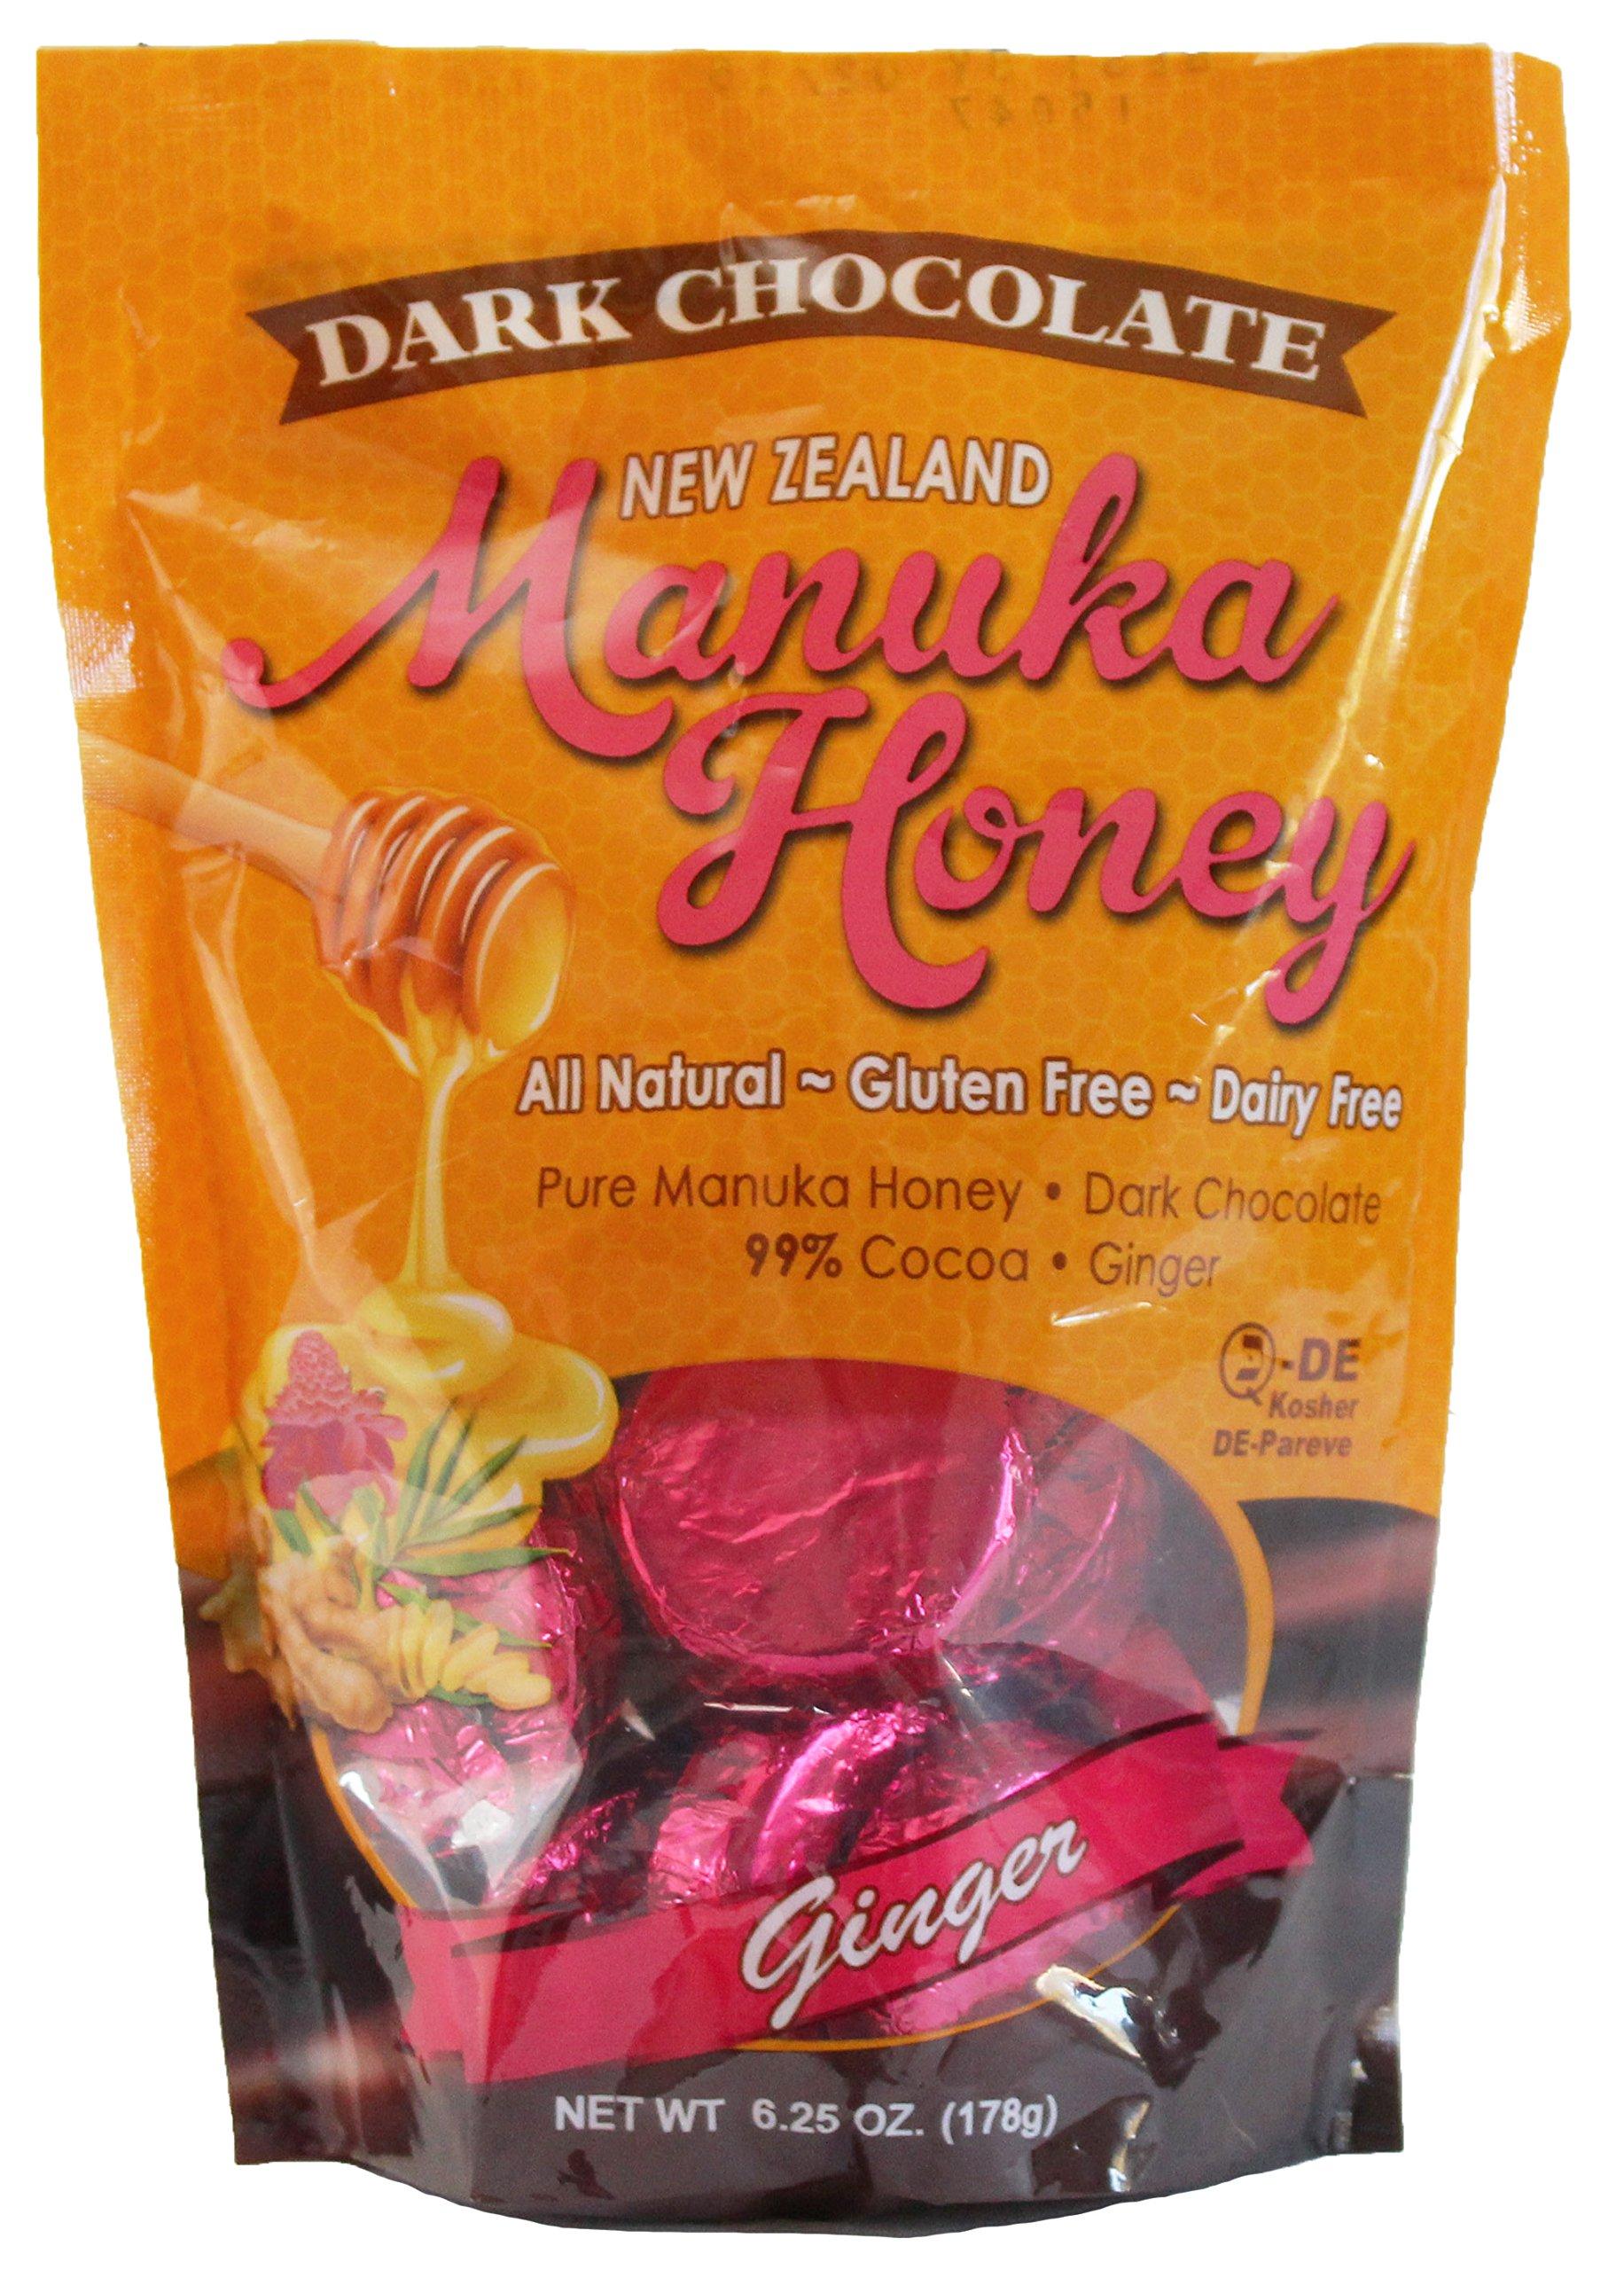 Manuka Honey Dark Chocolate with Ginger